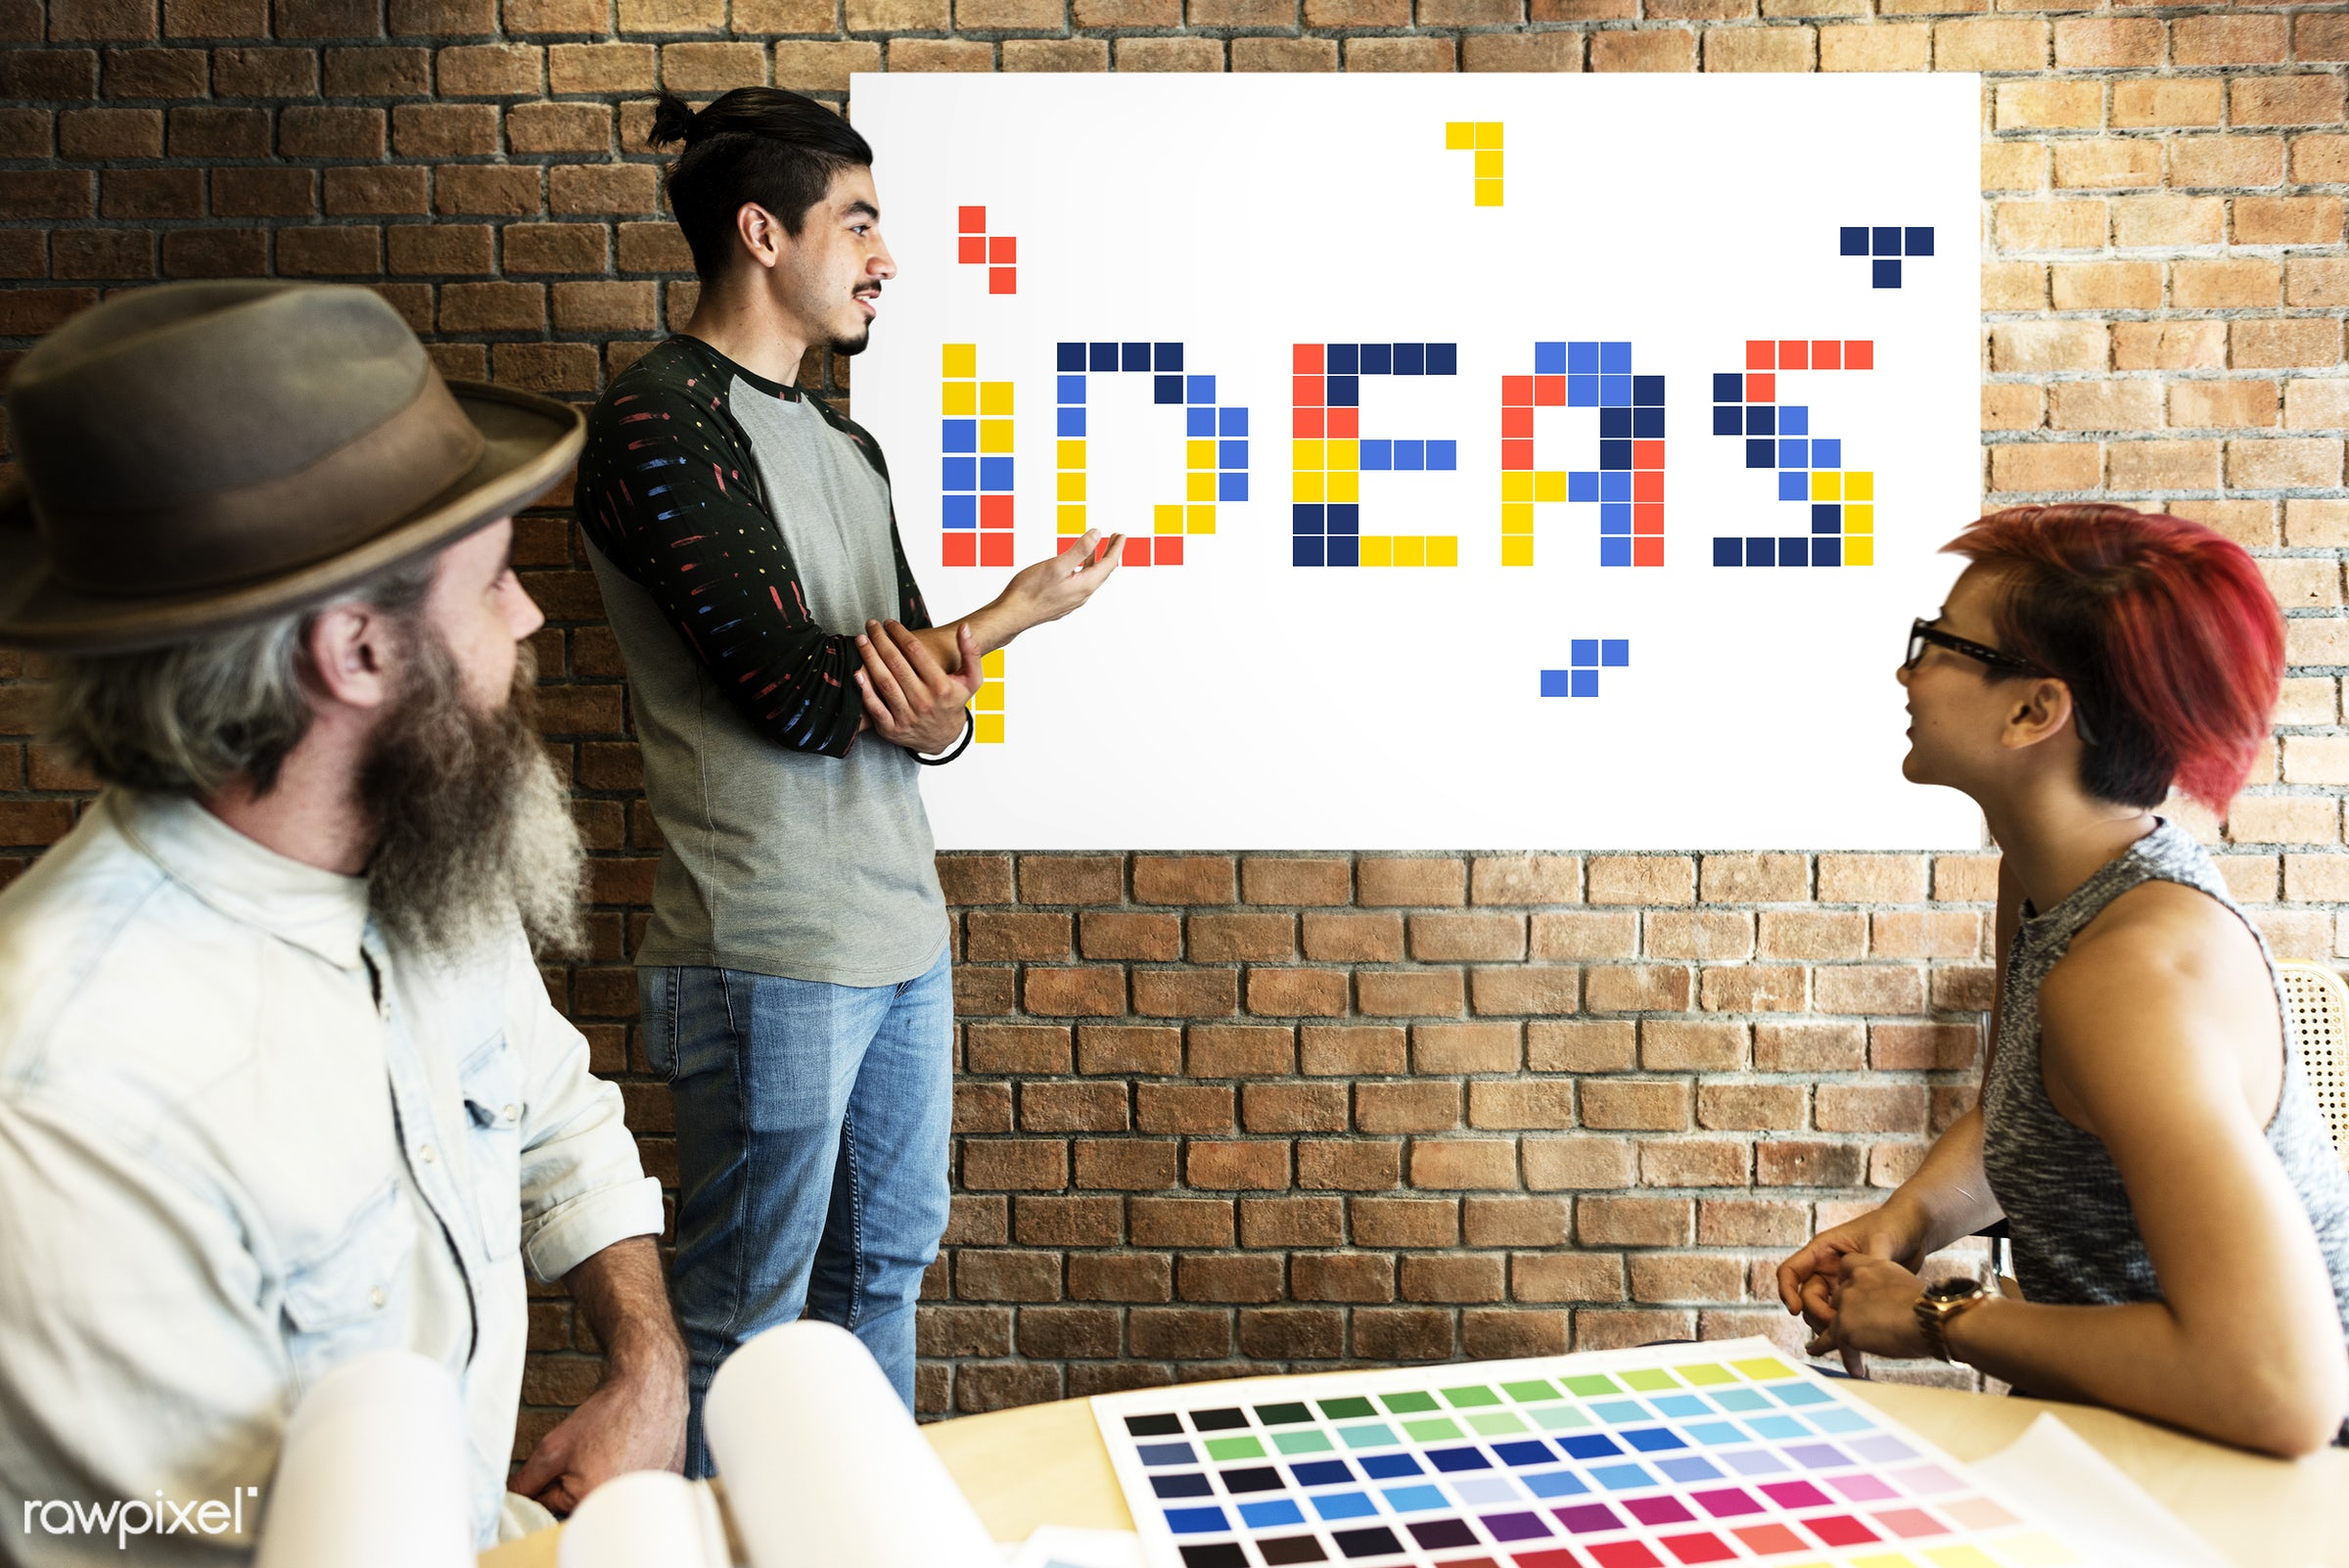 8 bit, art, artistry, beard, block, board, brick wall, chart, color chart, colors, creative, creativity, design, discussion...